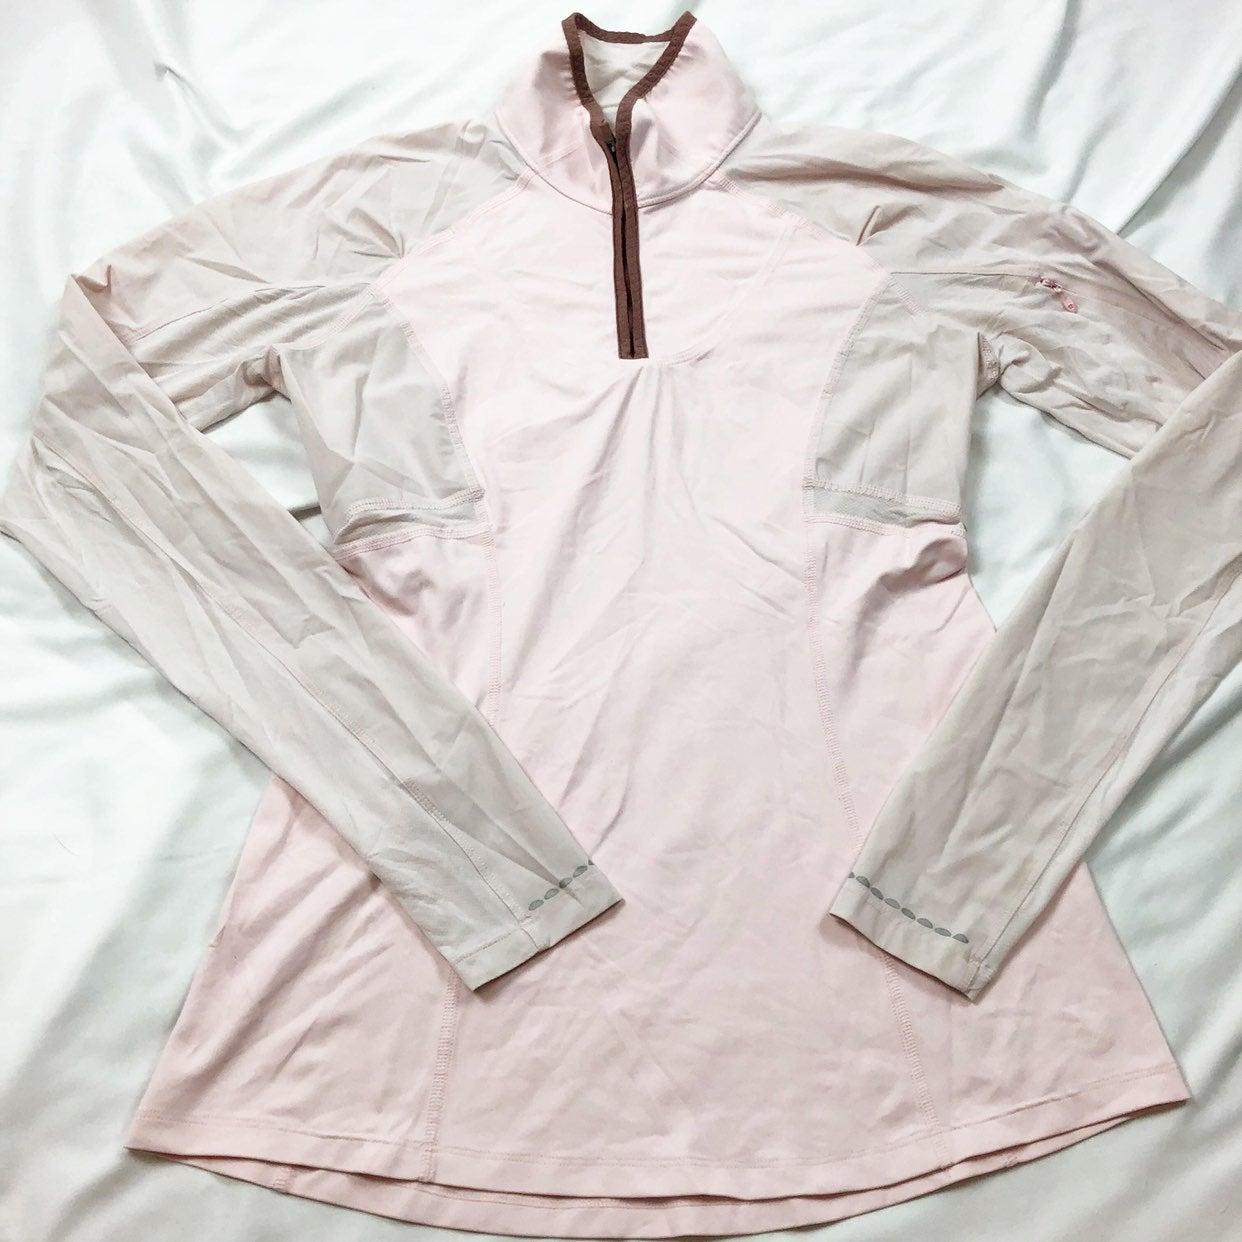 Lululemon light pink half zip